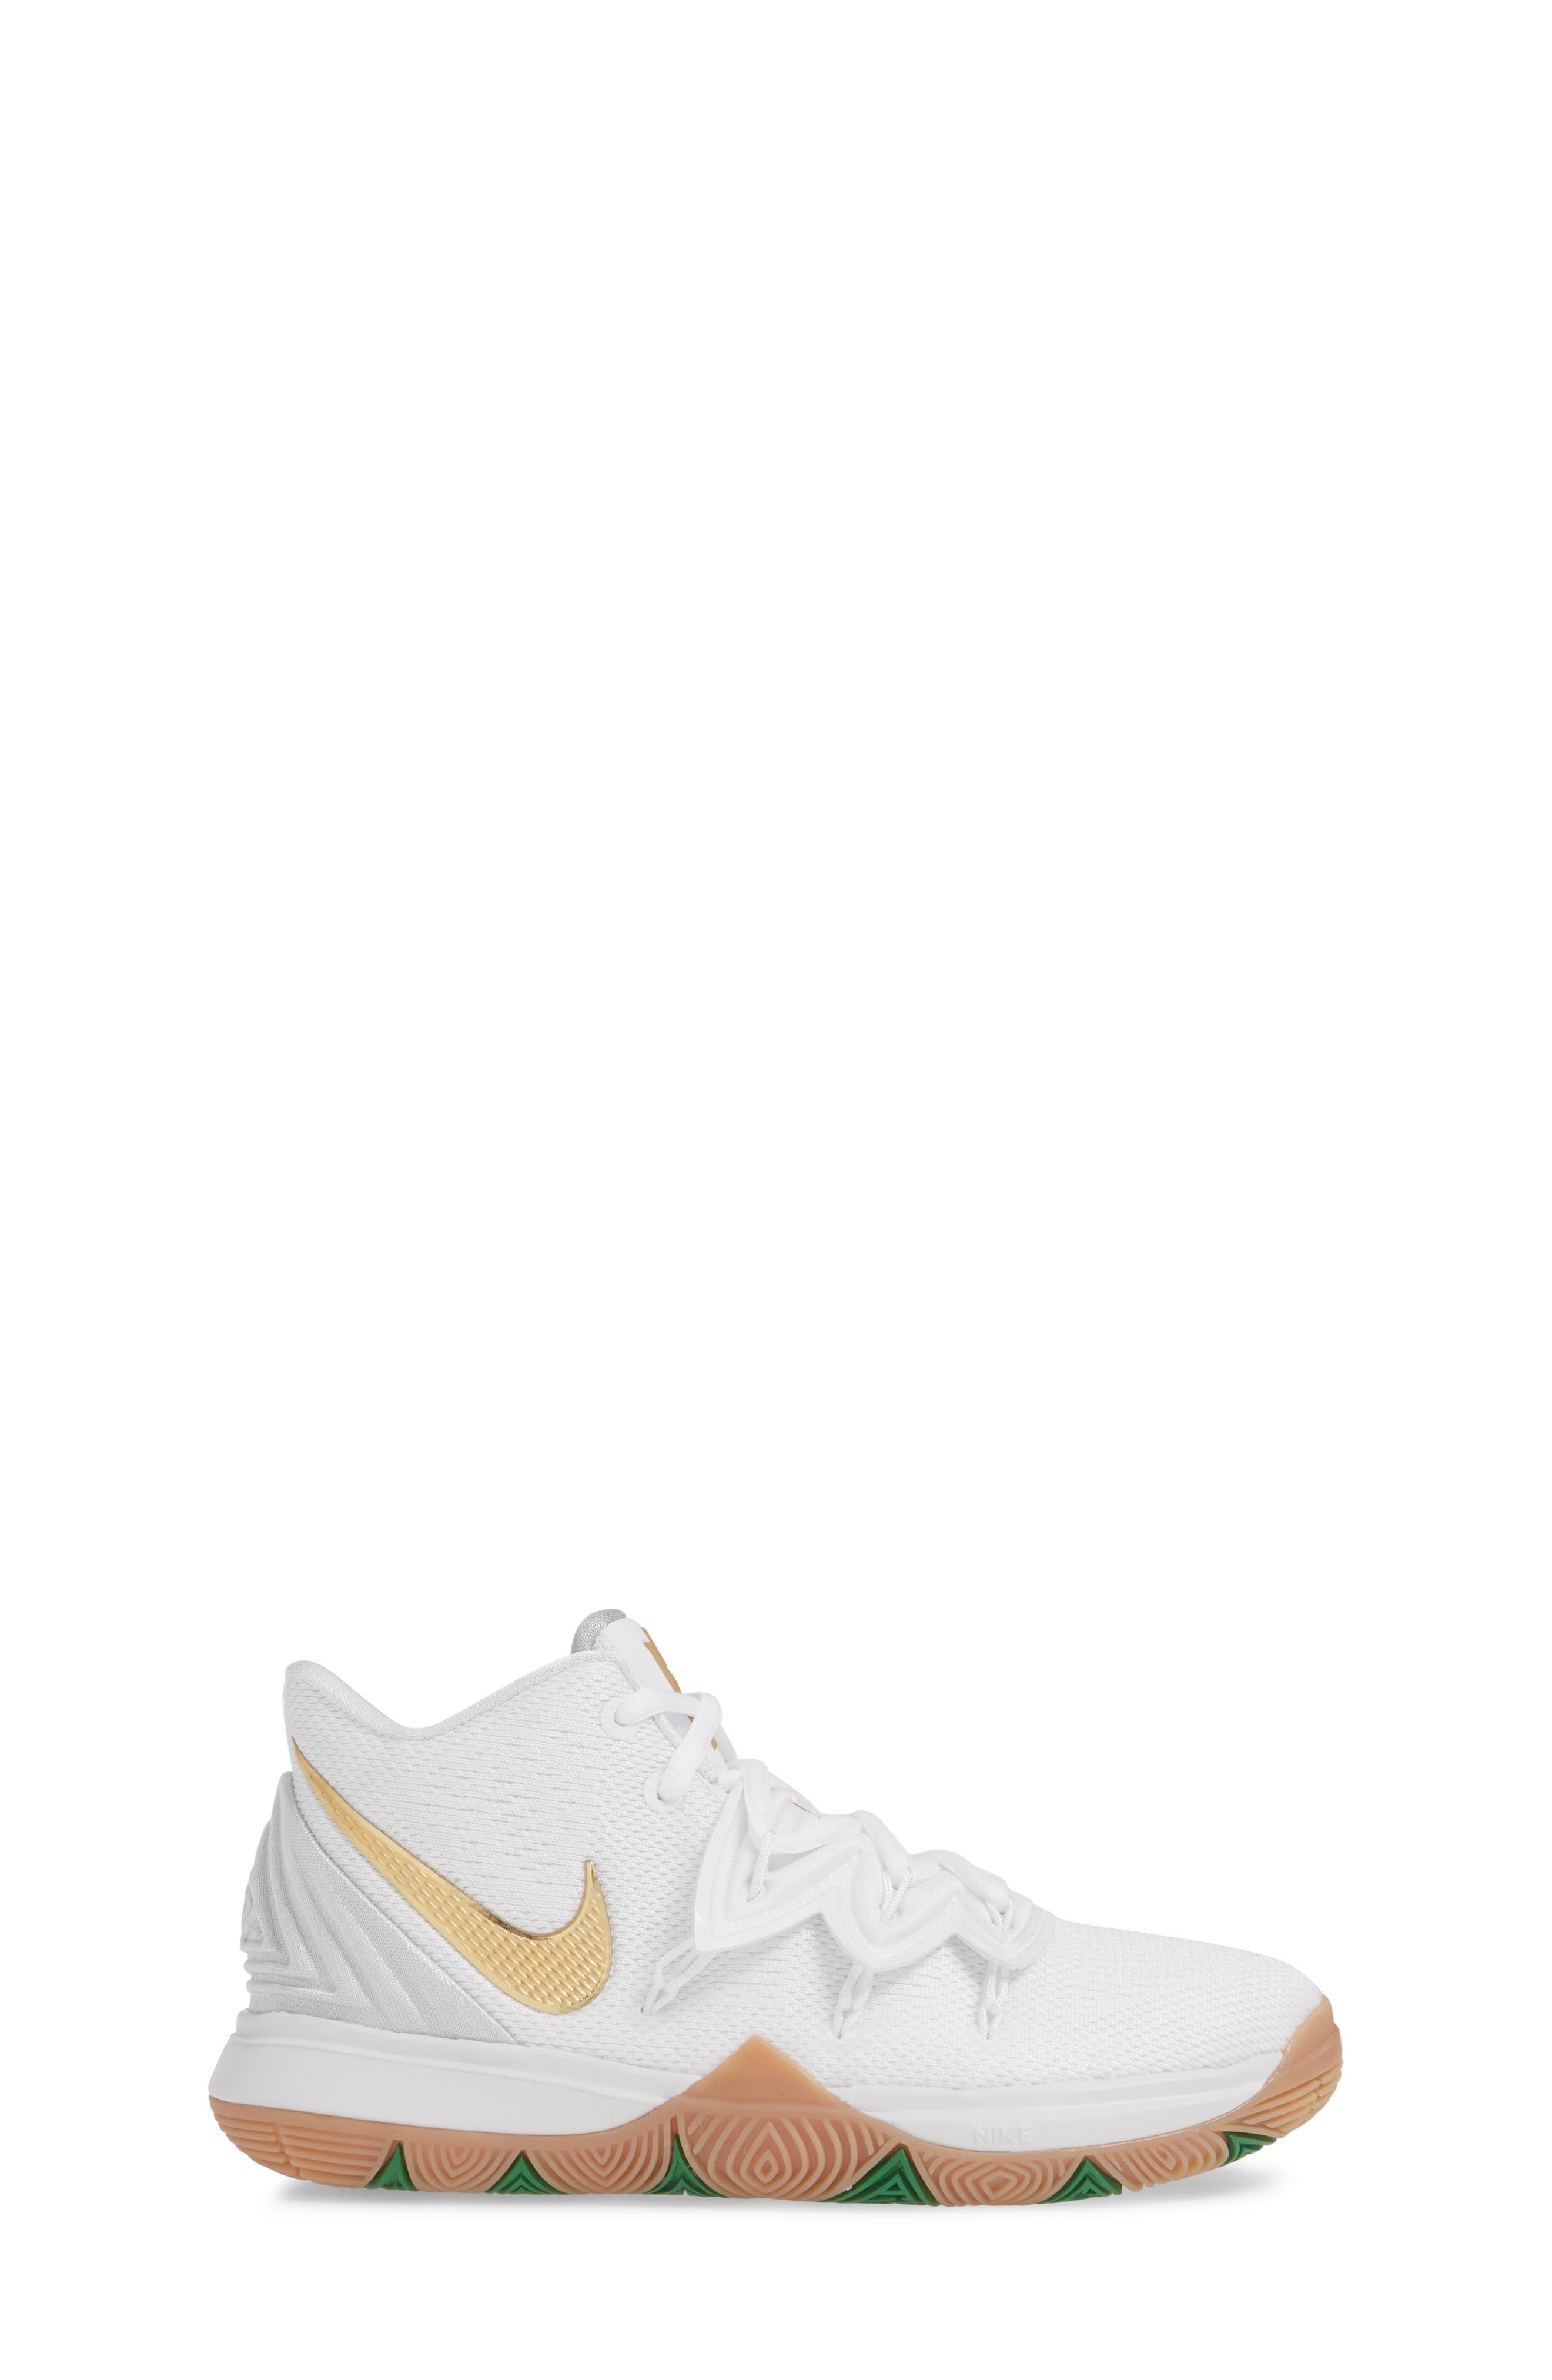 NIKE, Kyrie 5 Basketball Shoe, Alternate thumbnail 3, color, WHITE/ METALLIC GOLD-PLATINUM